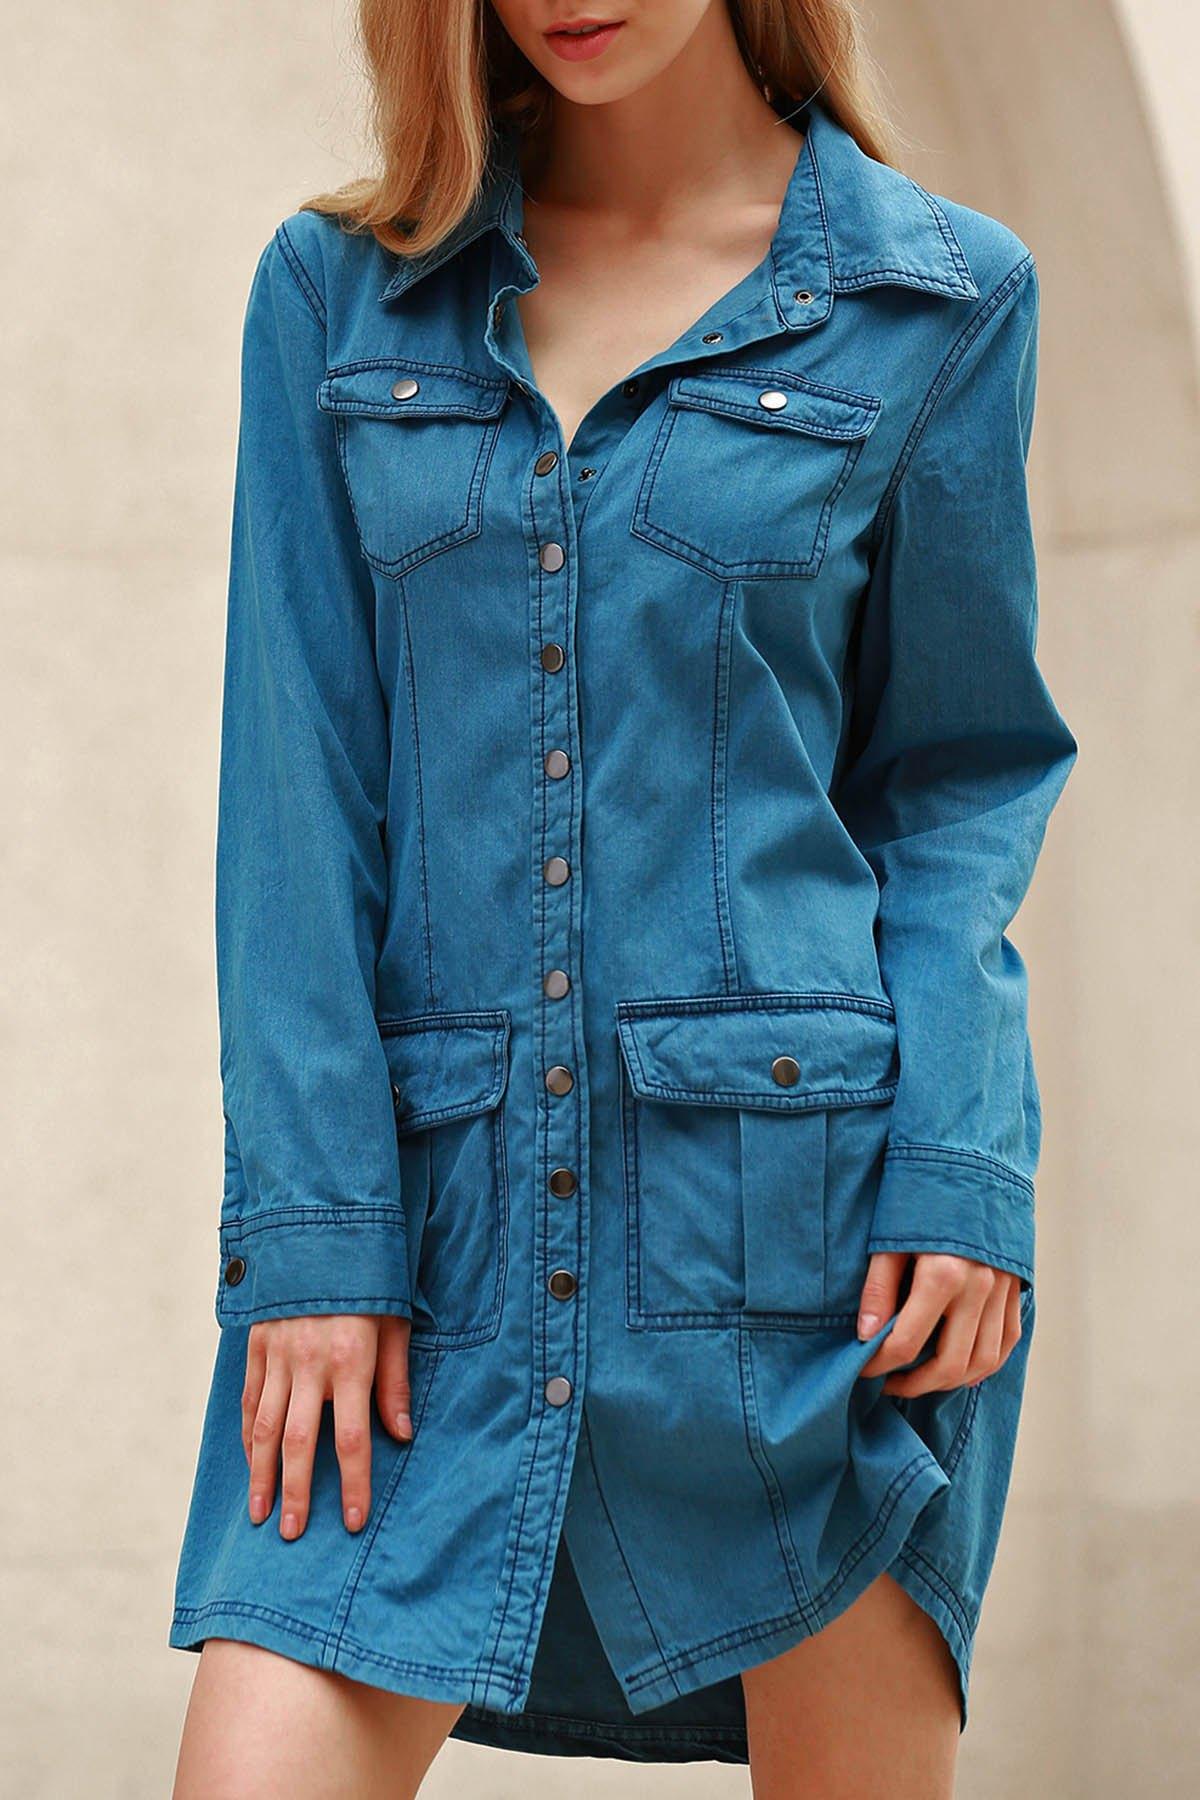 Turn Down Neck Long Sleeve Blue Denim Dress